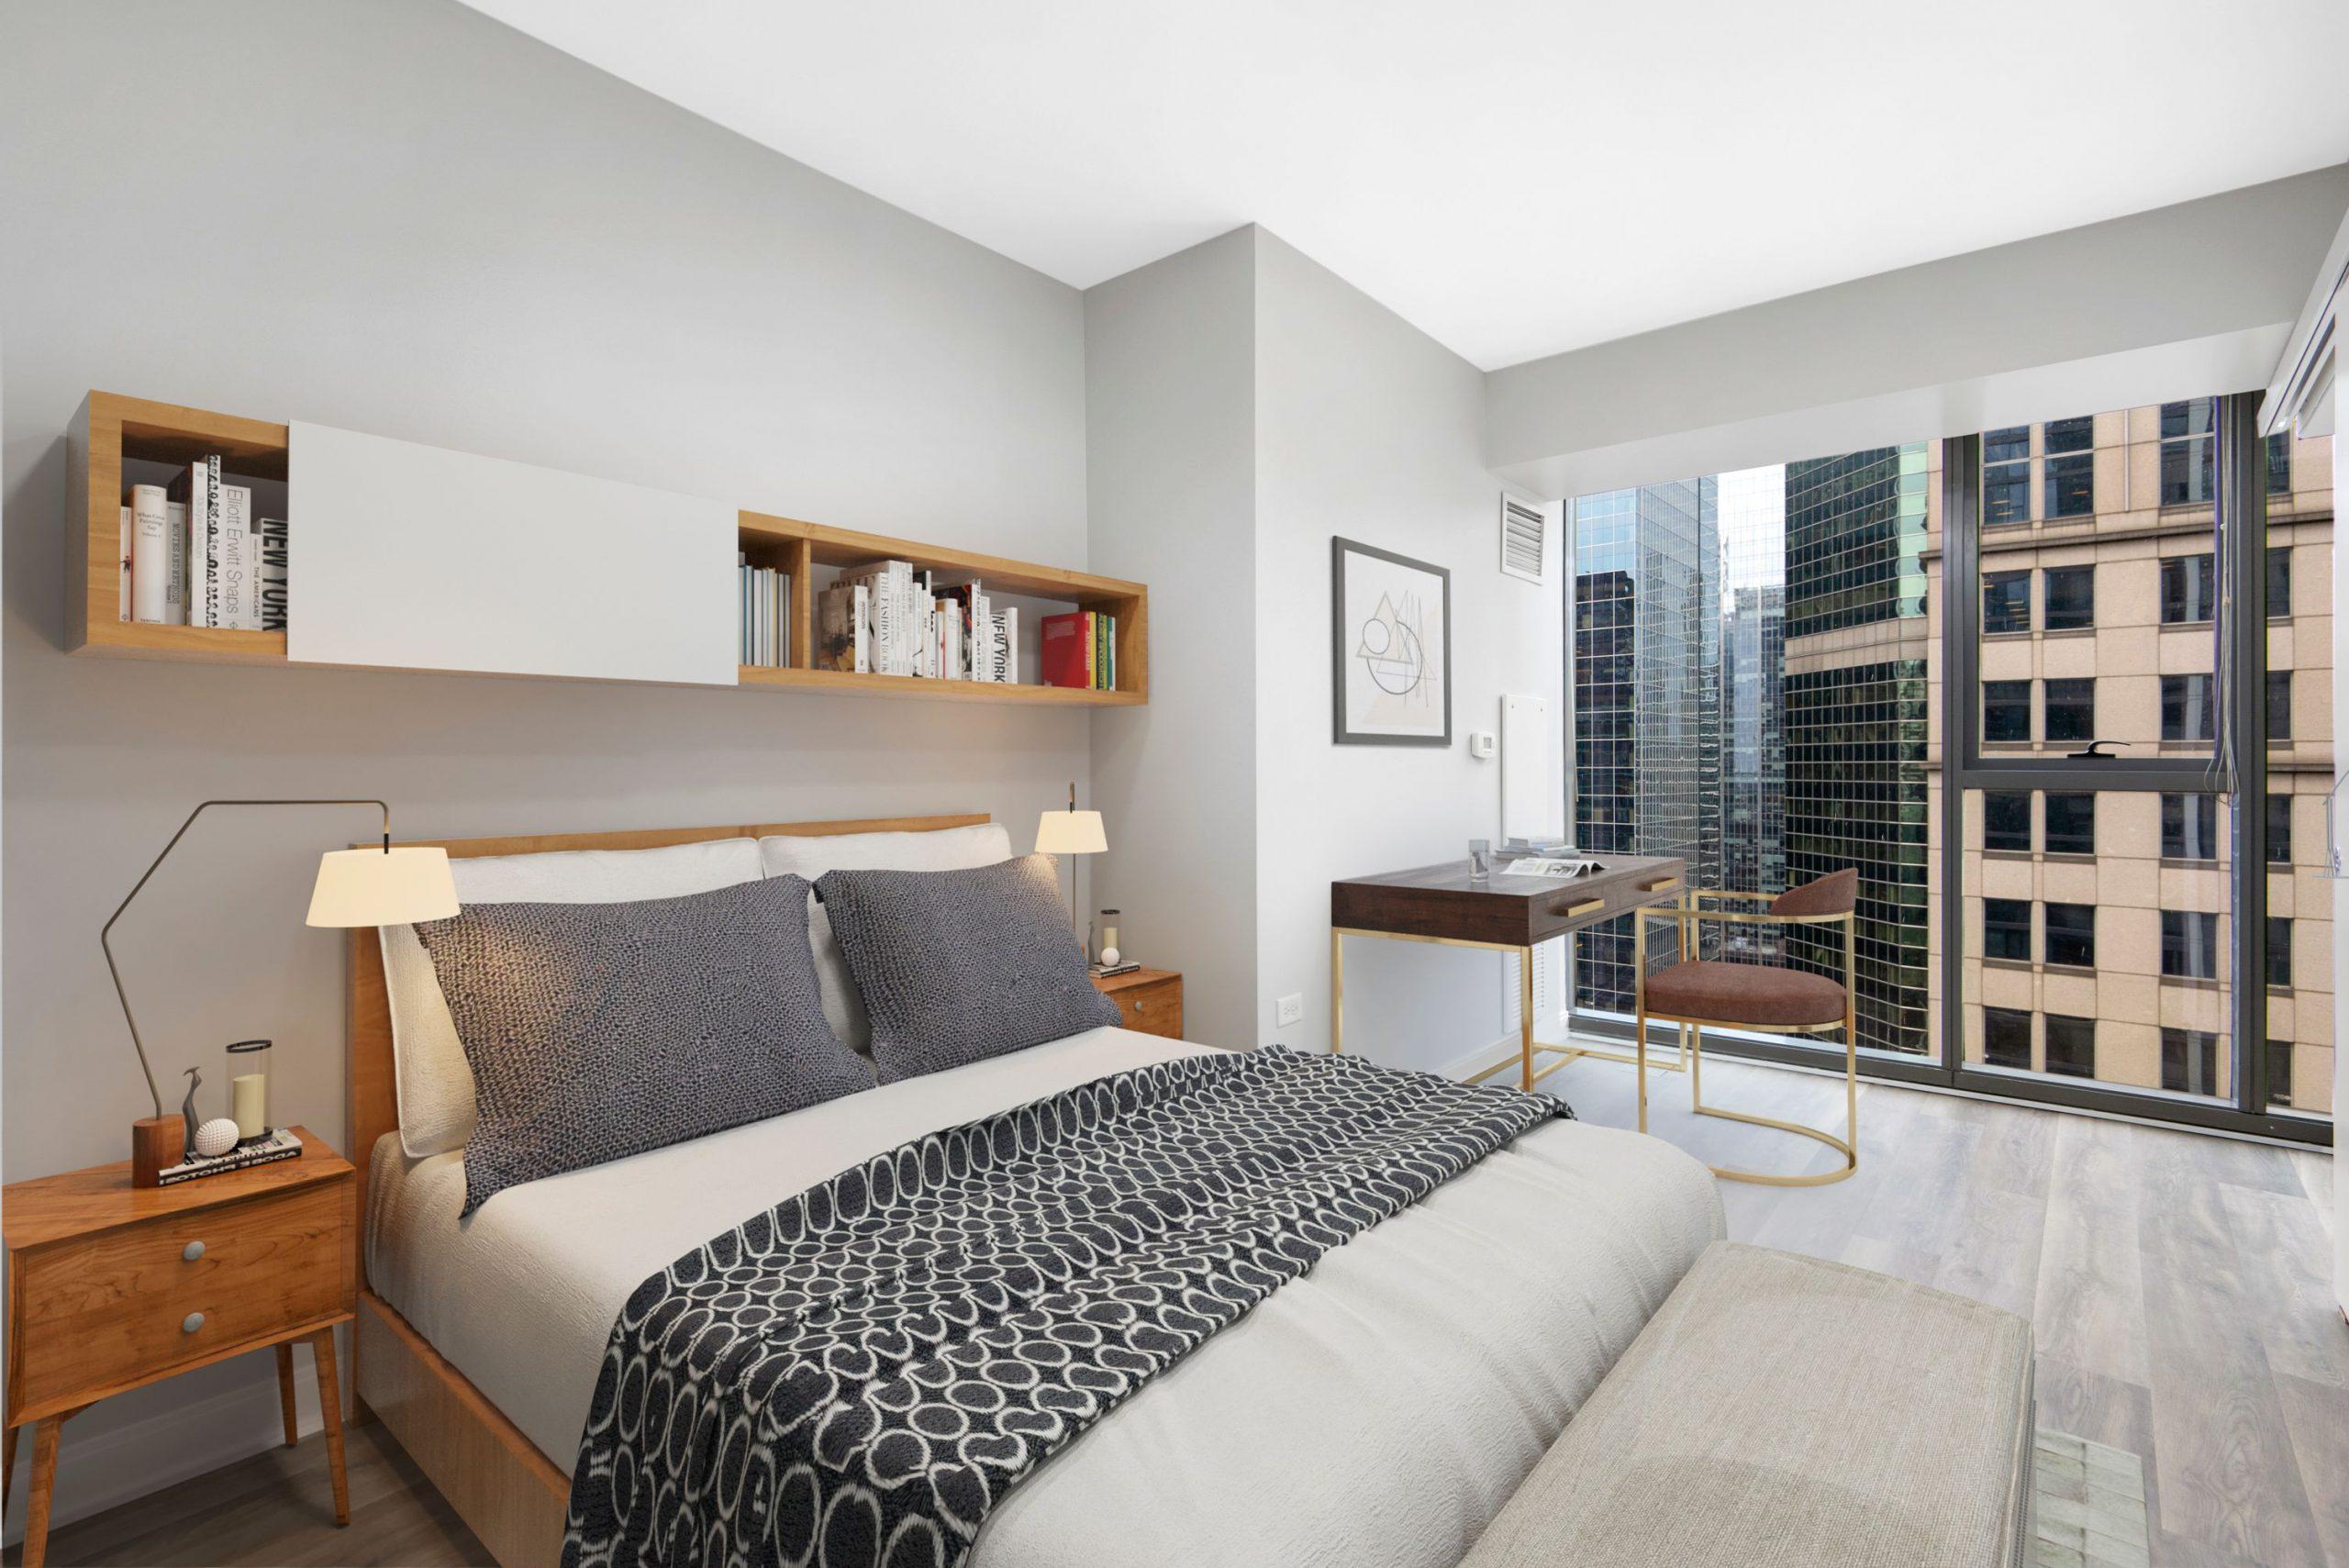 Lake & Wells Apartment Bedroom